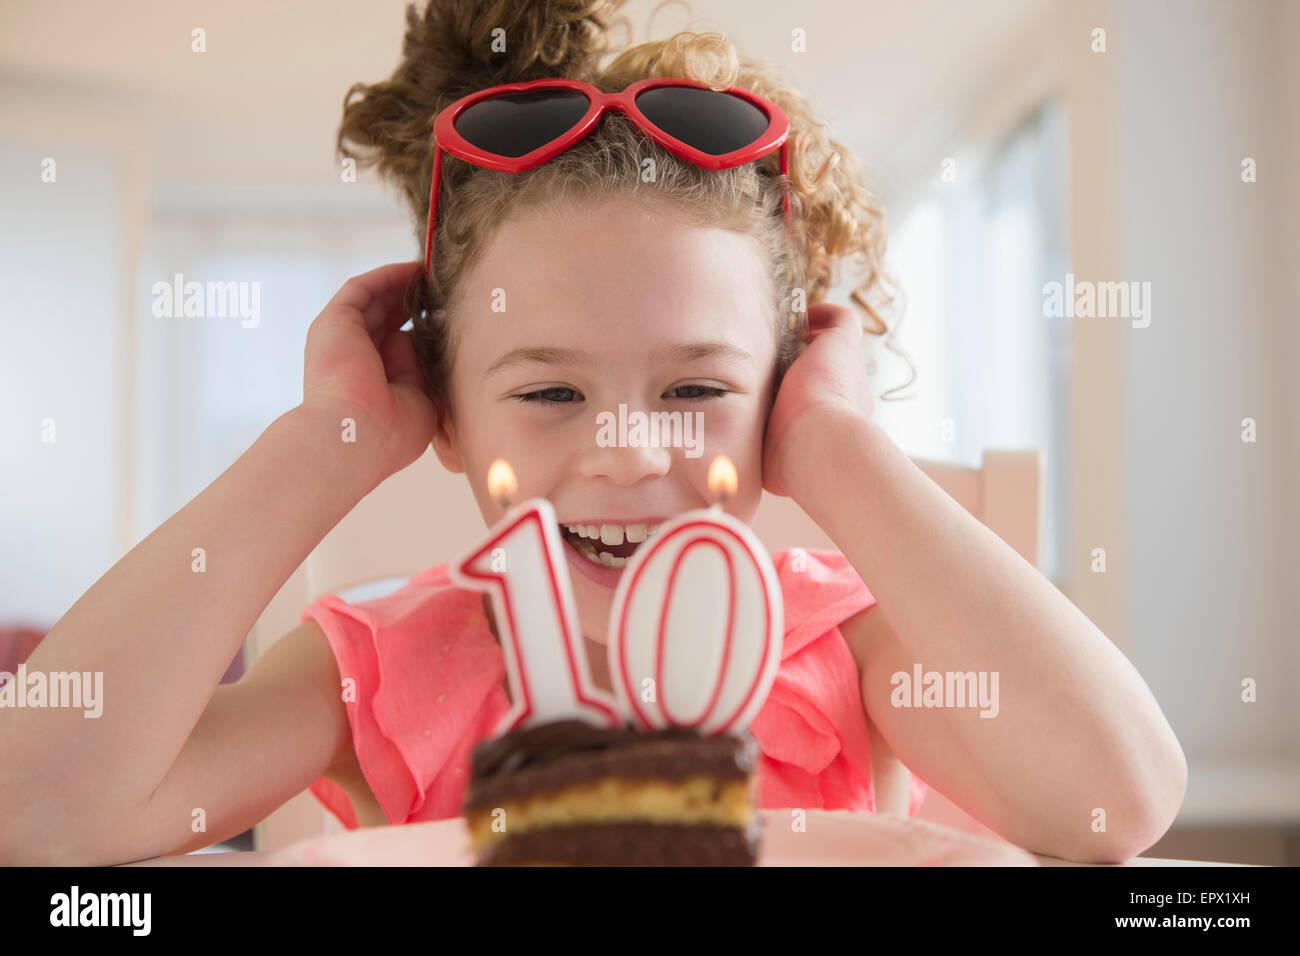 Girl (10-11) celebrating 10th birthday - Stock Image